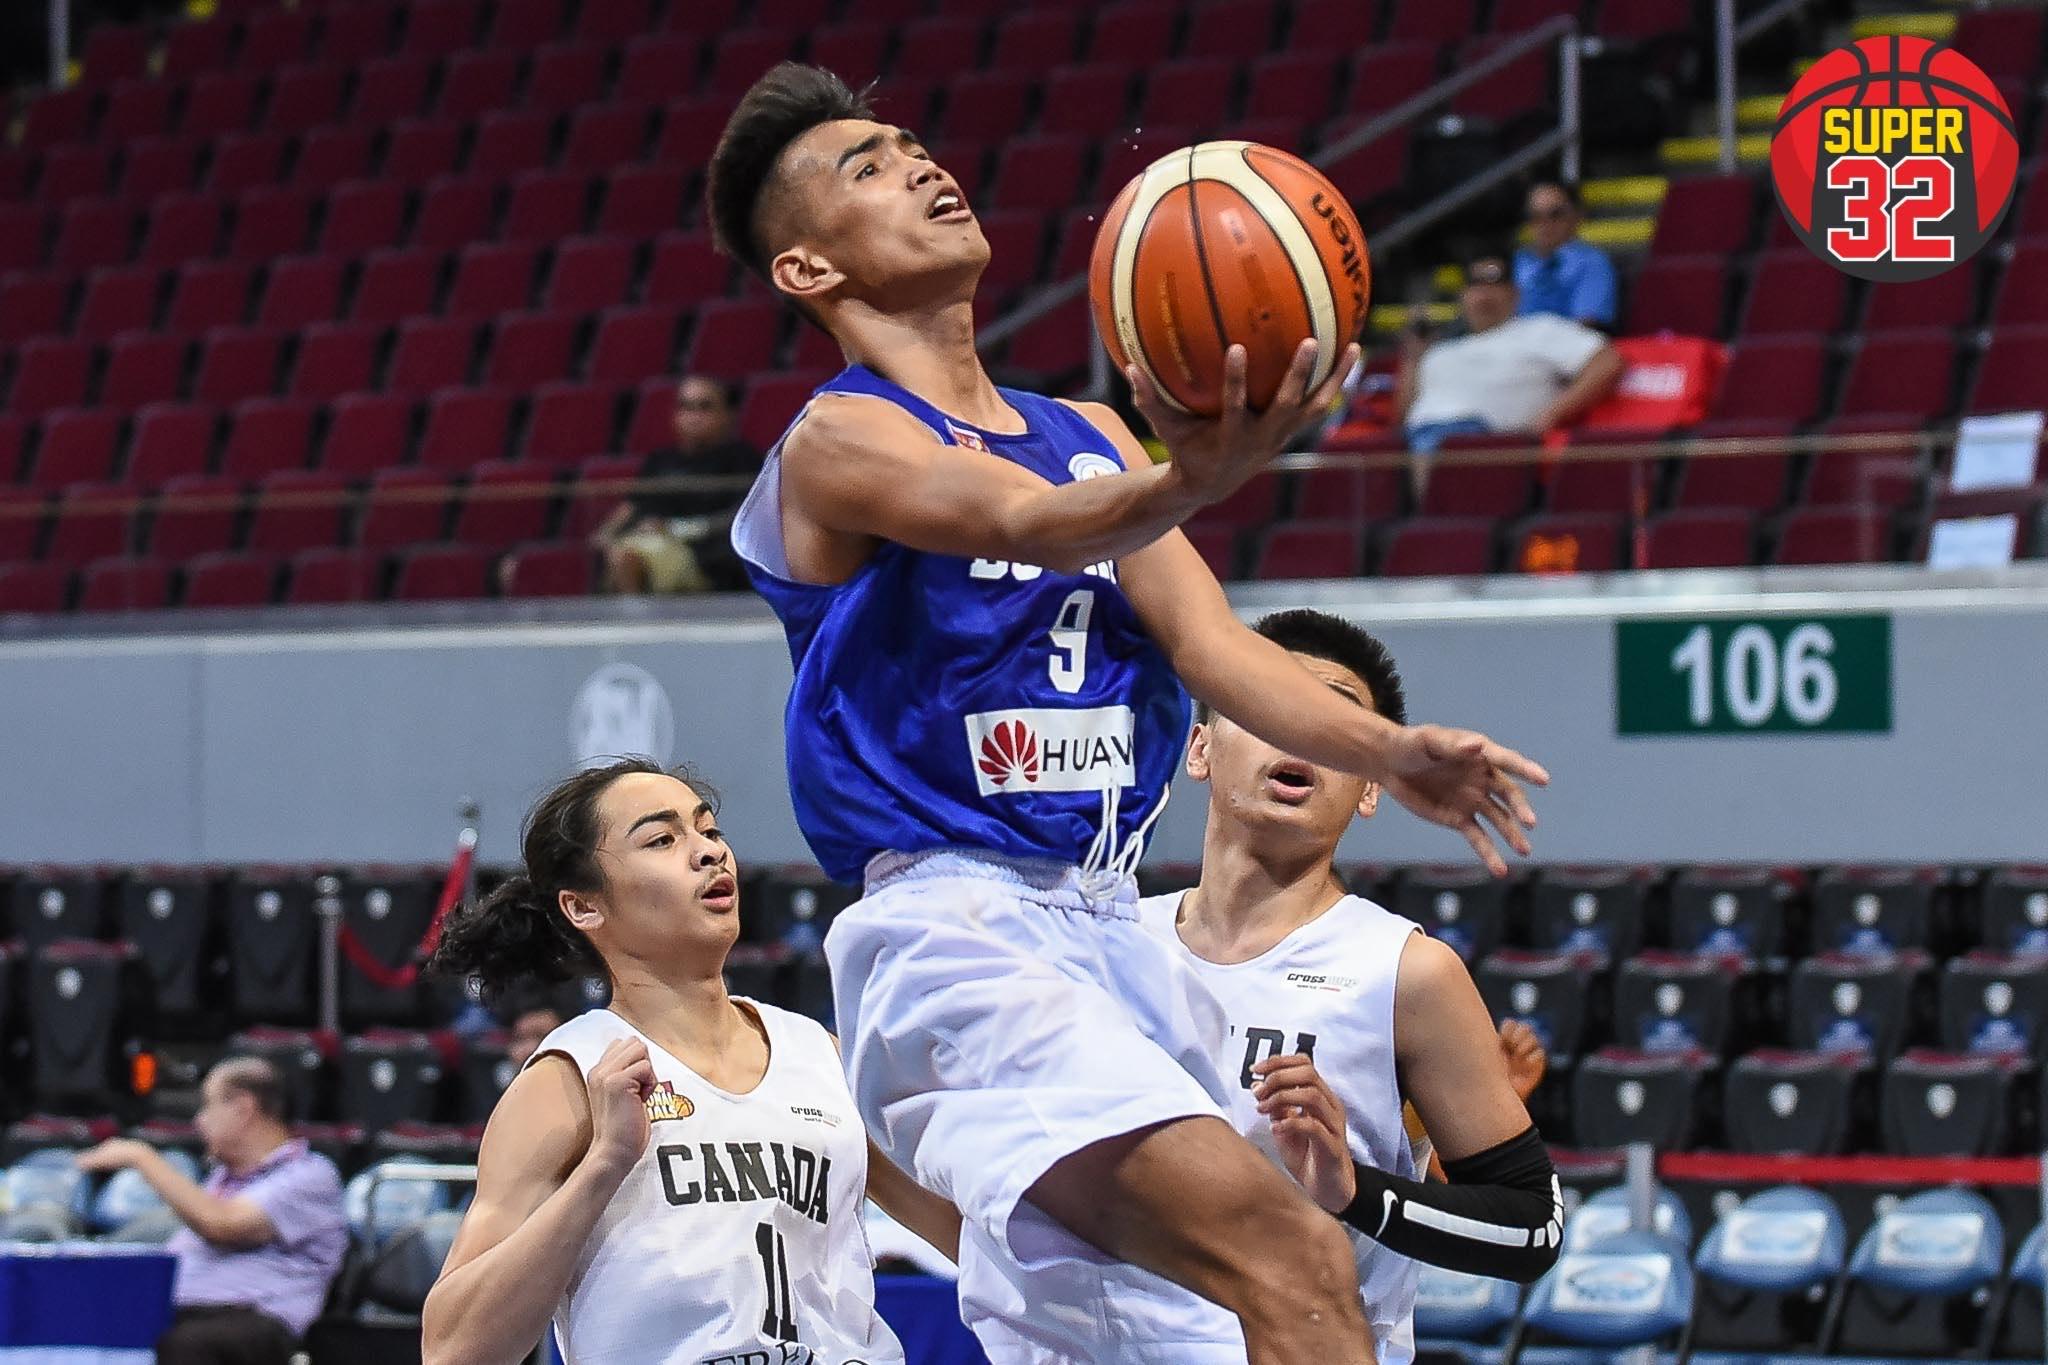 2019-nbtc-finals-super-32-durham-def-fcpc-john-bravo UCSAA MVP John Bravo commits to Lyceum Basketball LPU NCAA News UCSAA  - philippine sports news